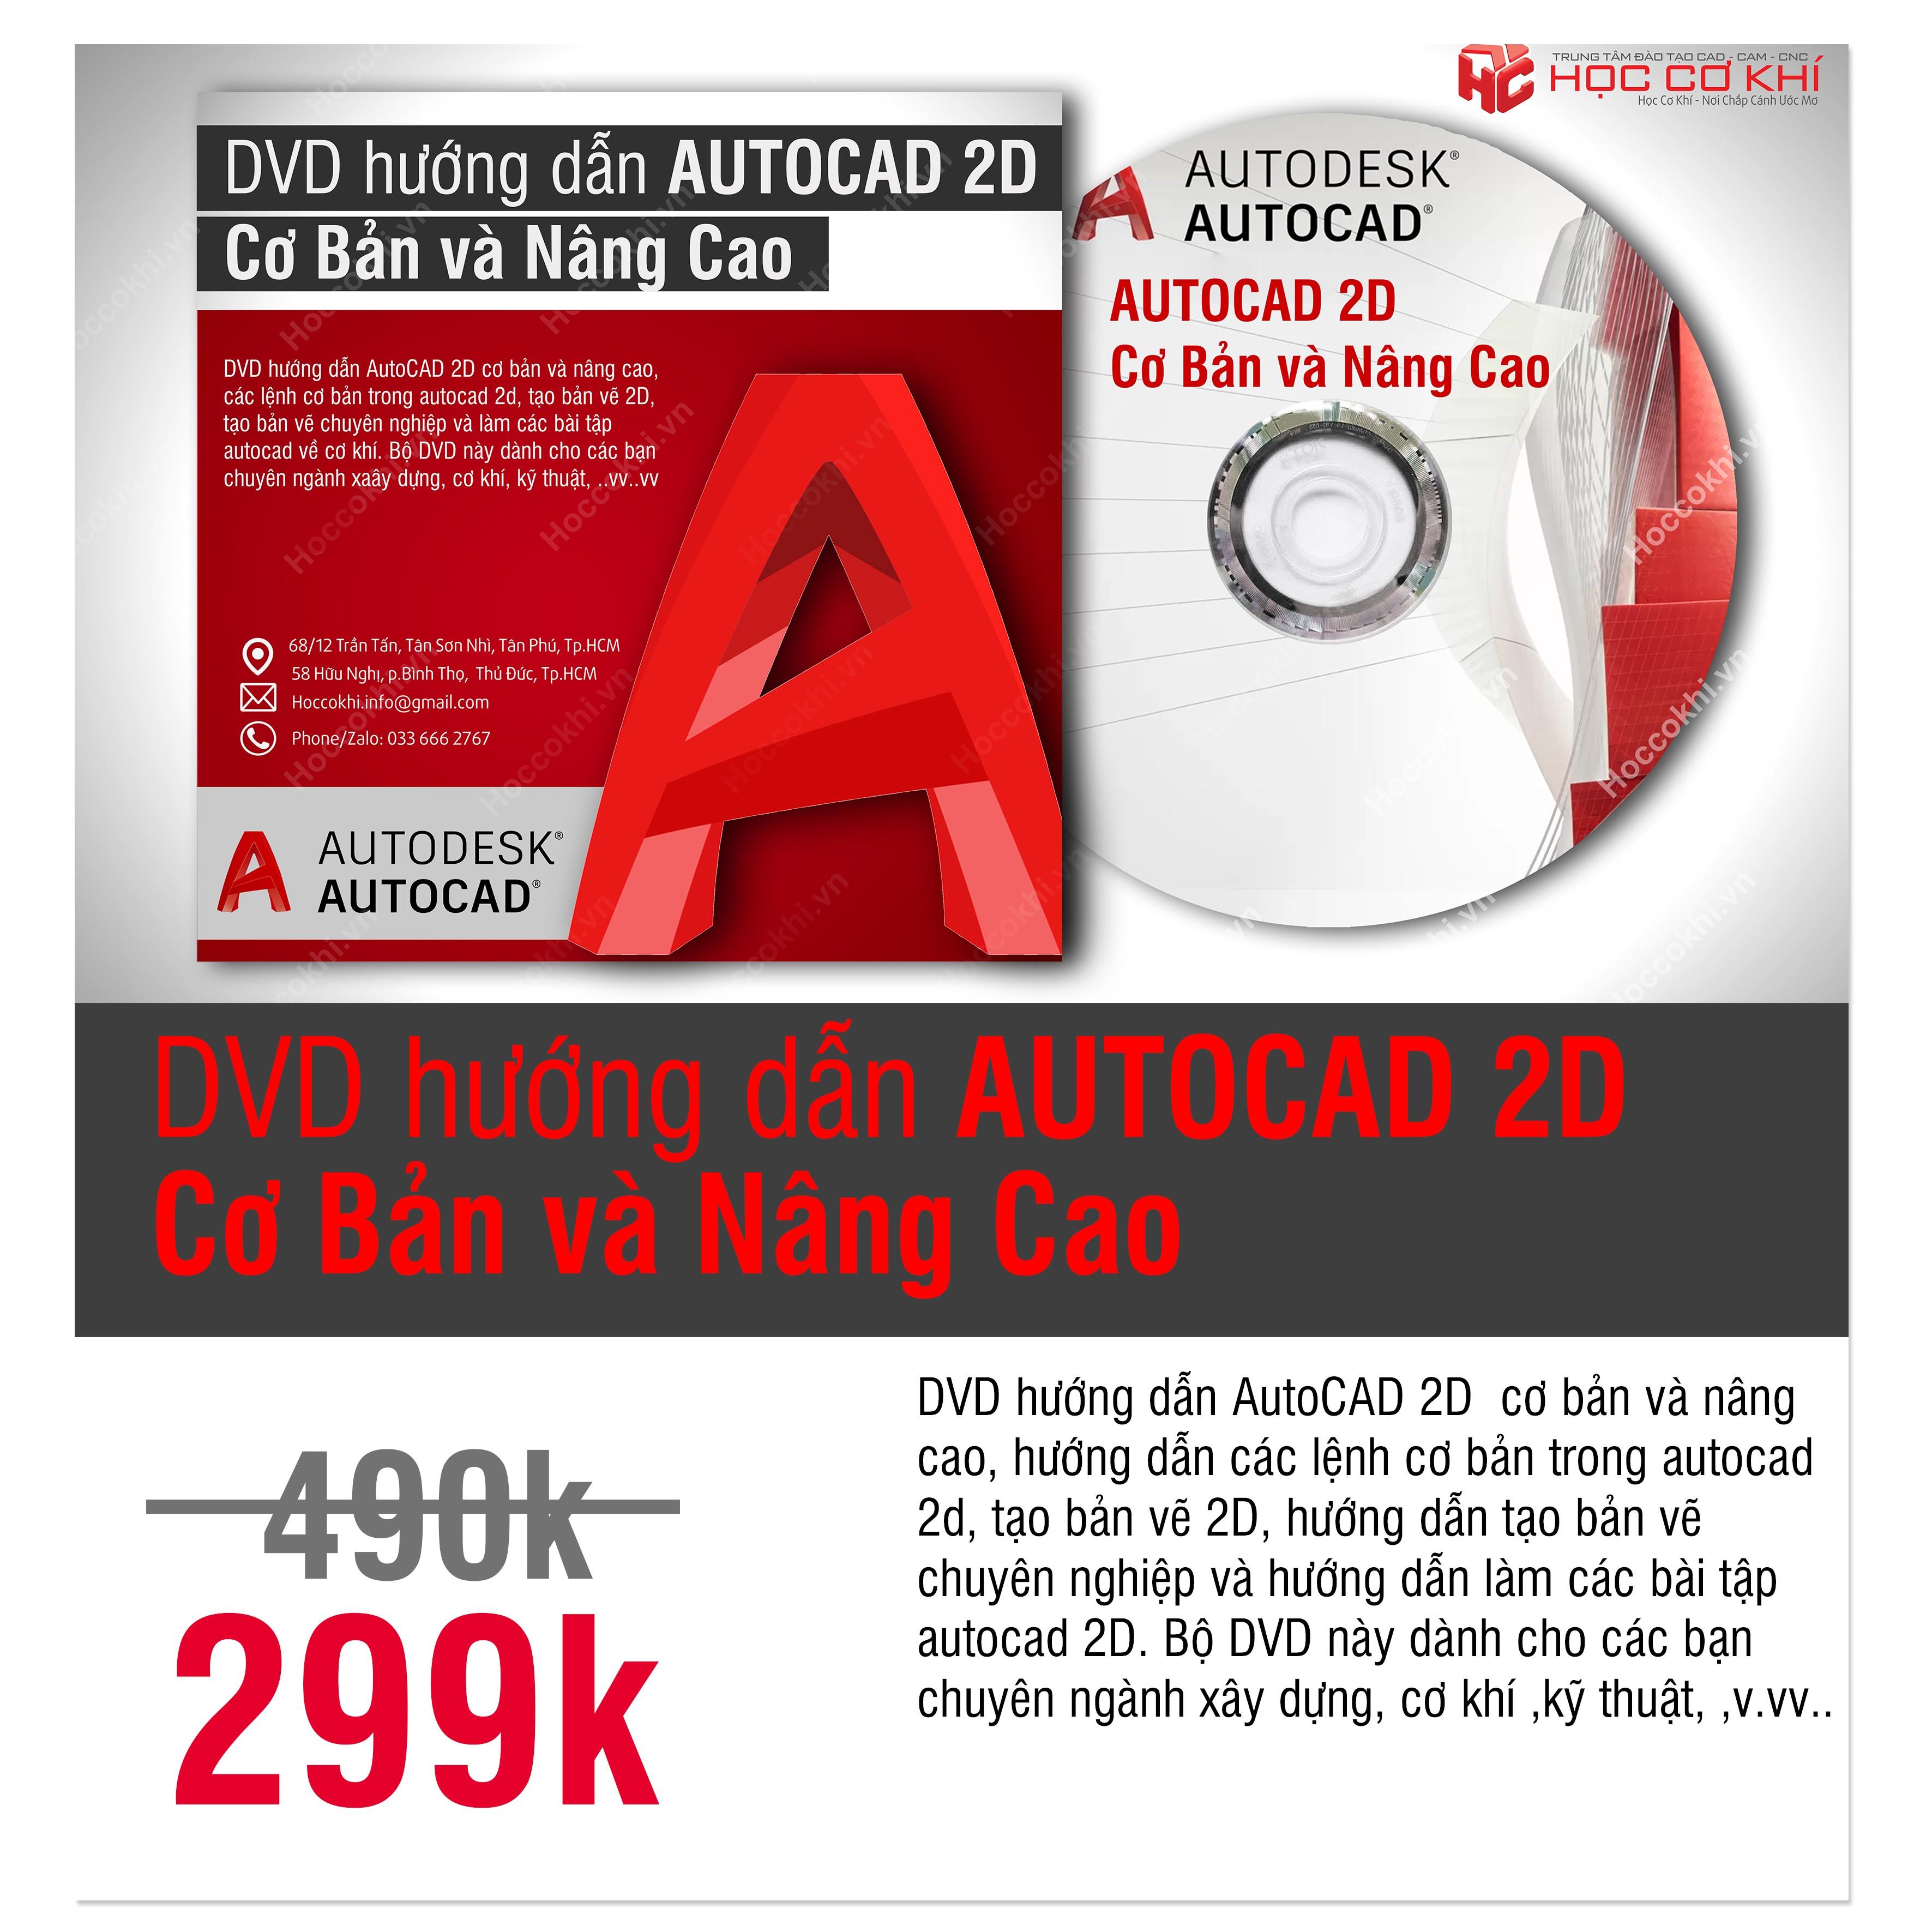 DVD hướng dẫn AutoCAD 2020 tự học Autocad hiệu quả